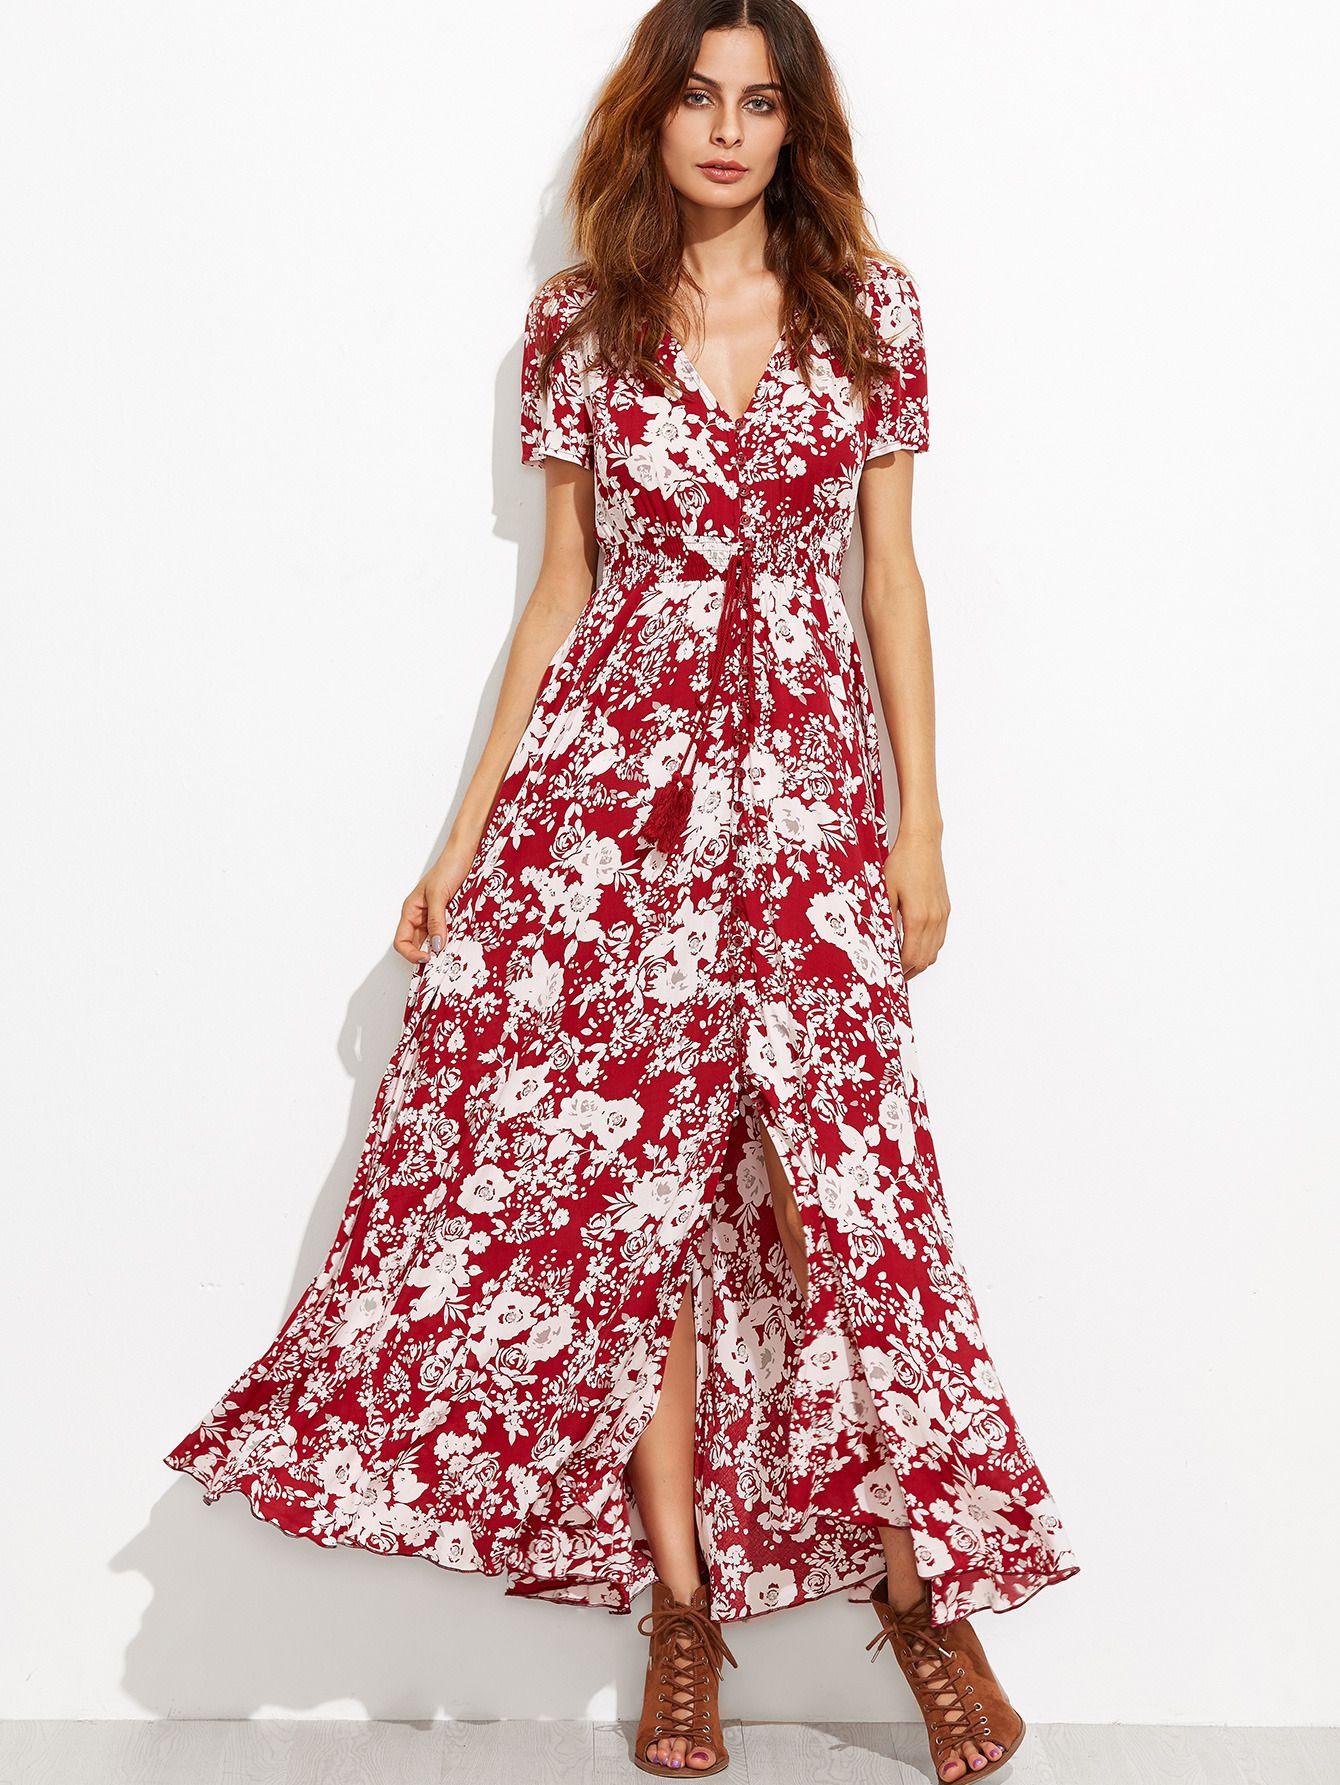 Burgundy Floral Self Tie Fringe Split Dress   Caro   Pinterest ...